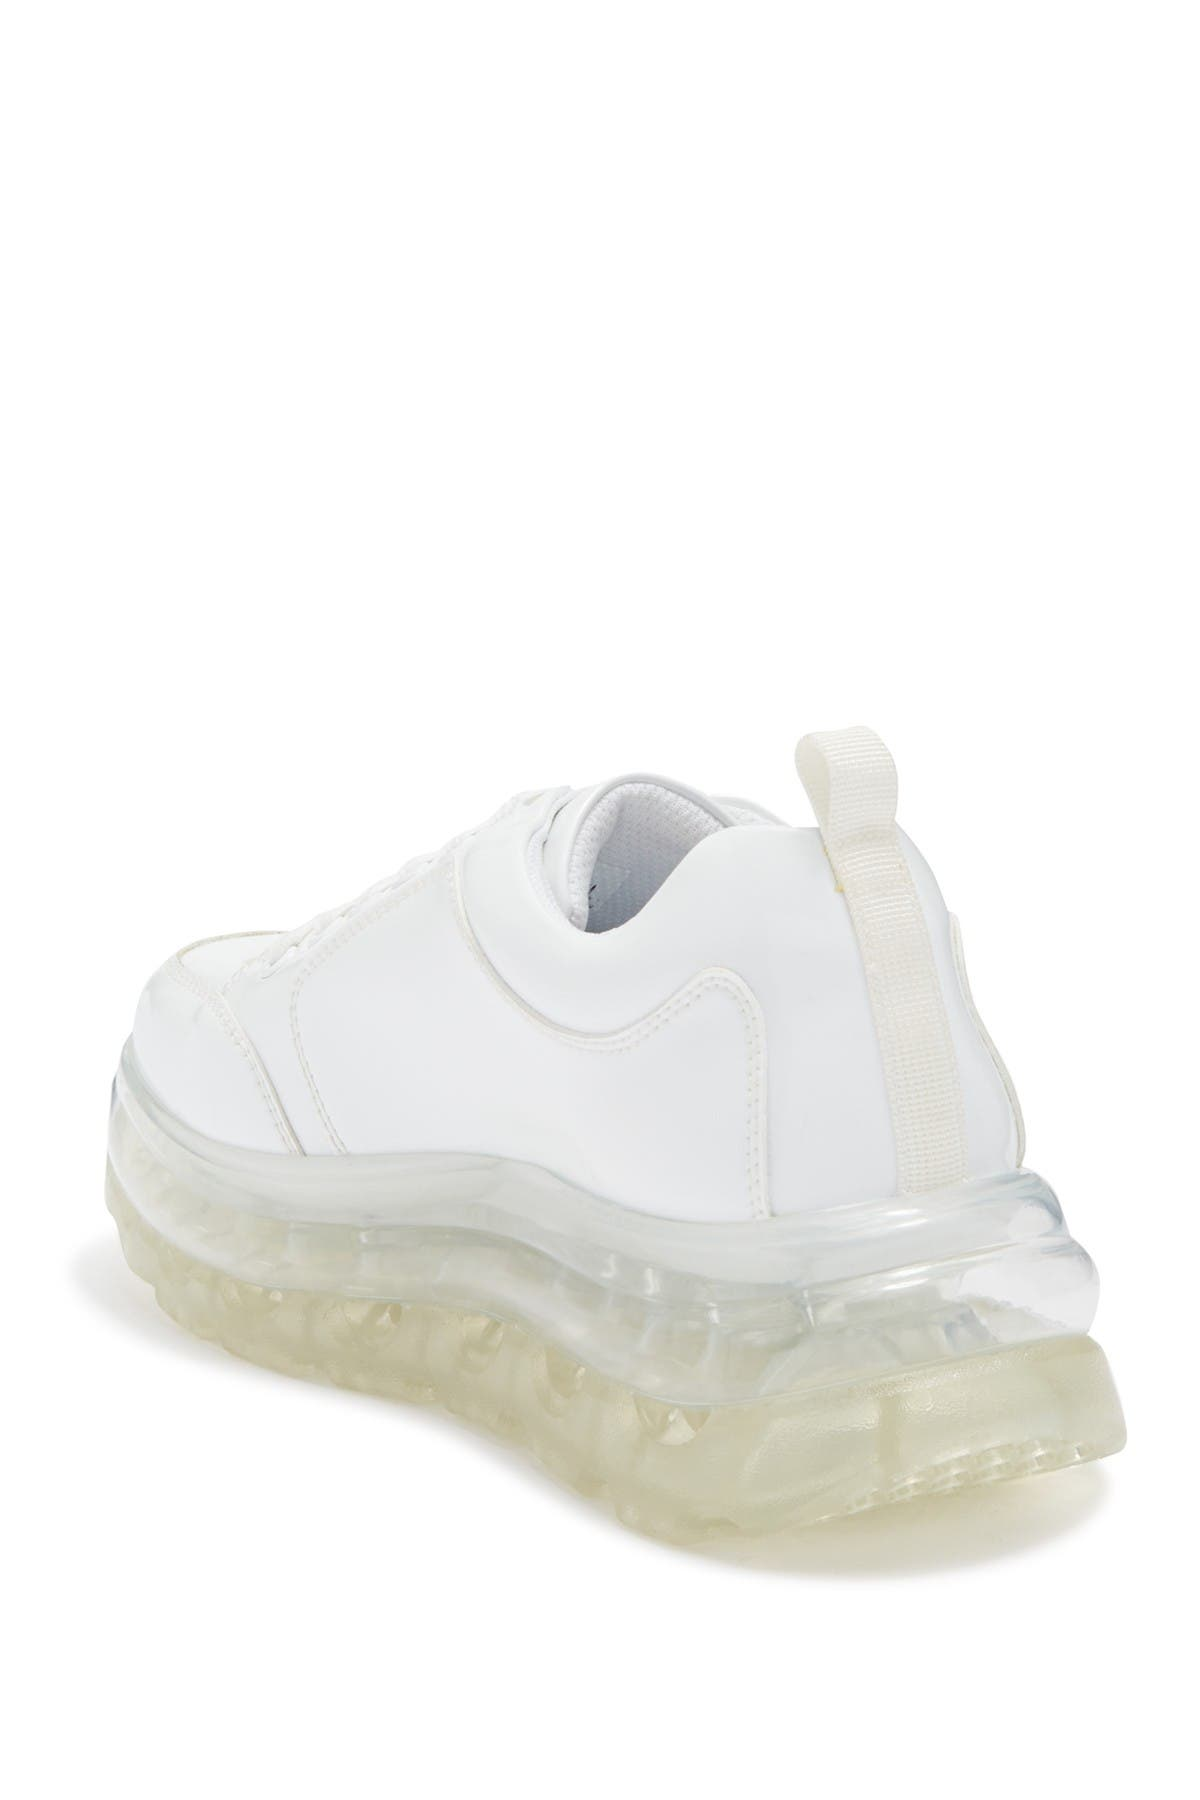 Image of Jeffrey Campbell Spawn Mega Bottom Sneaker